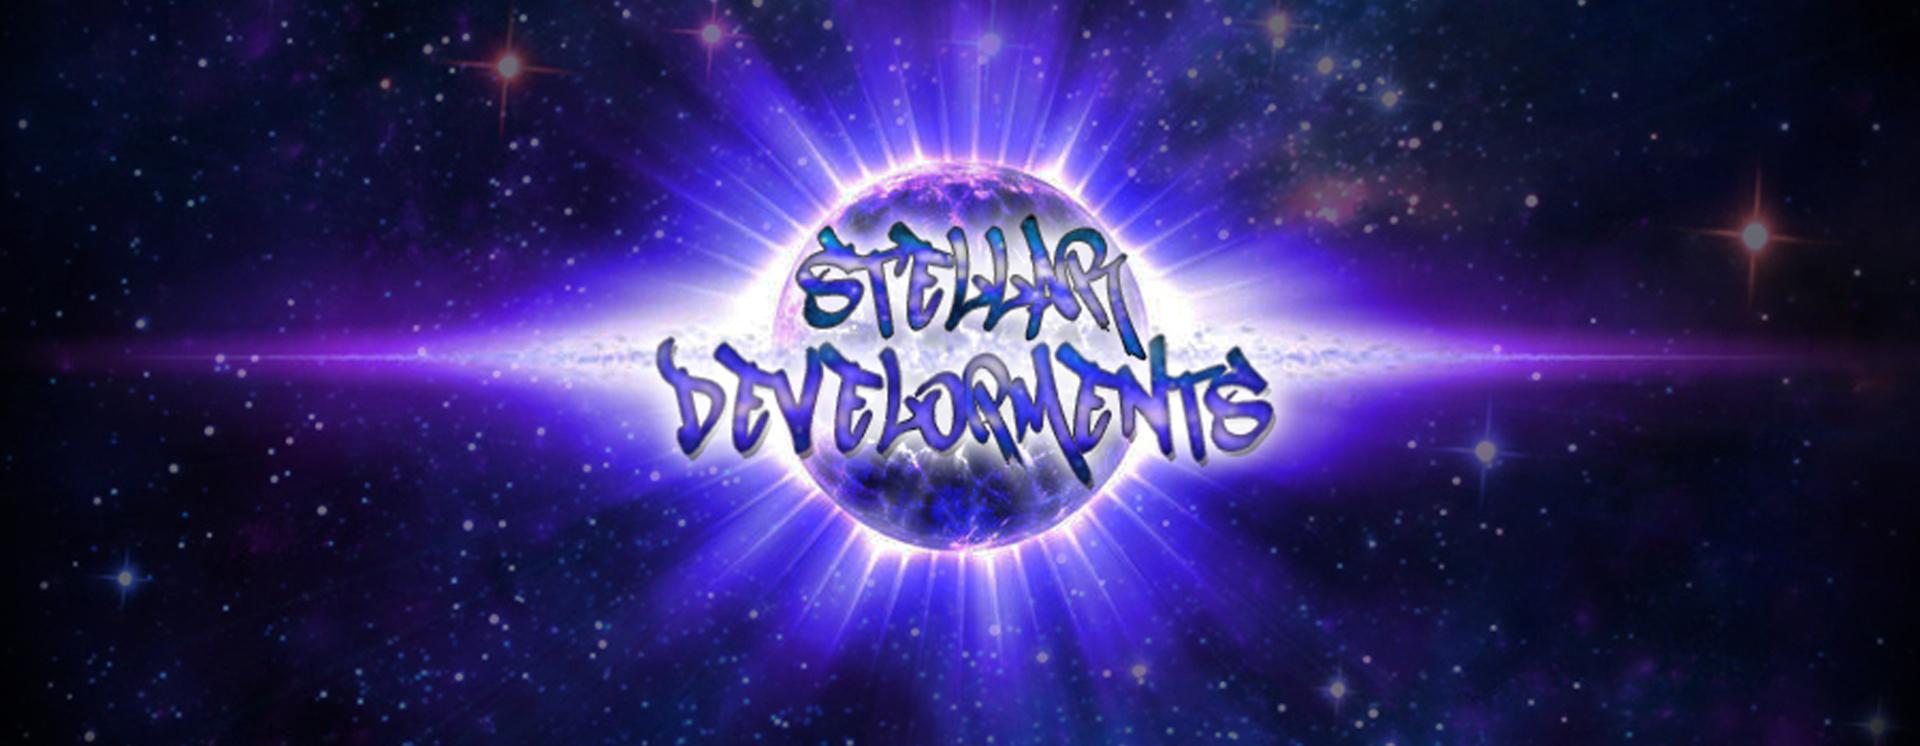 1438735156 stellarframe copy